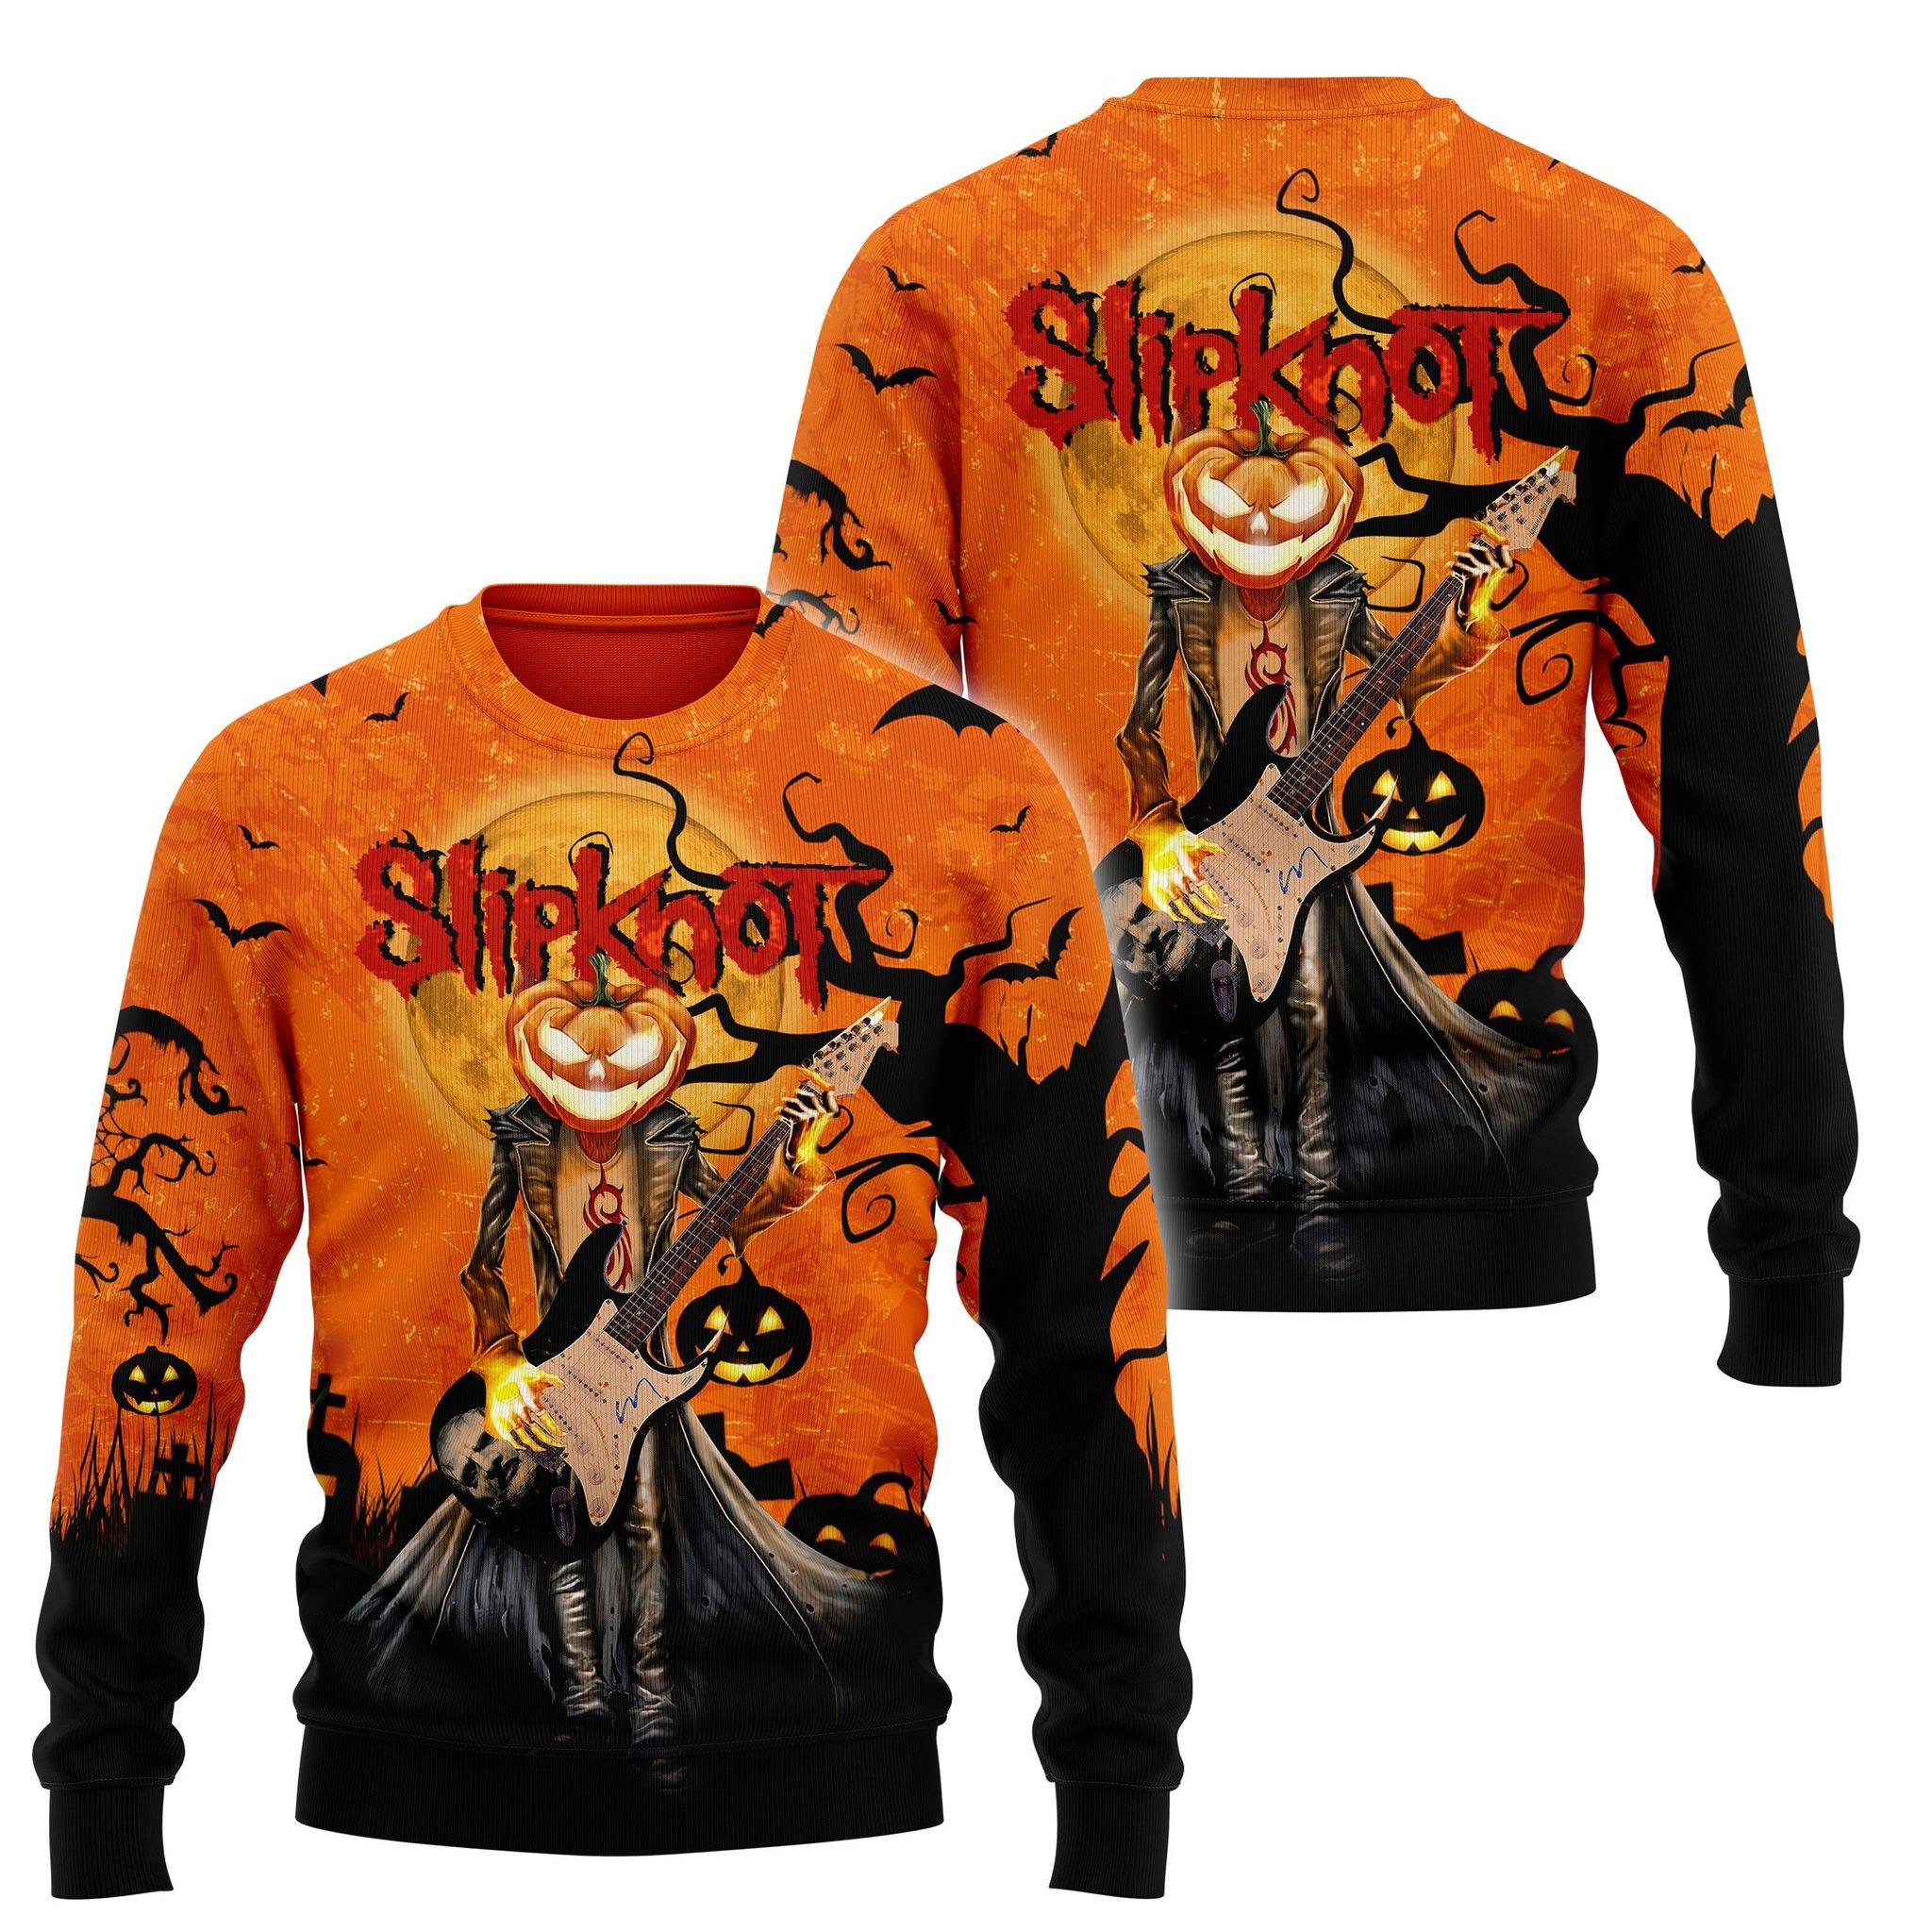 Slipknot Halloween 3d hoodie and shirt 1